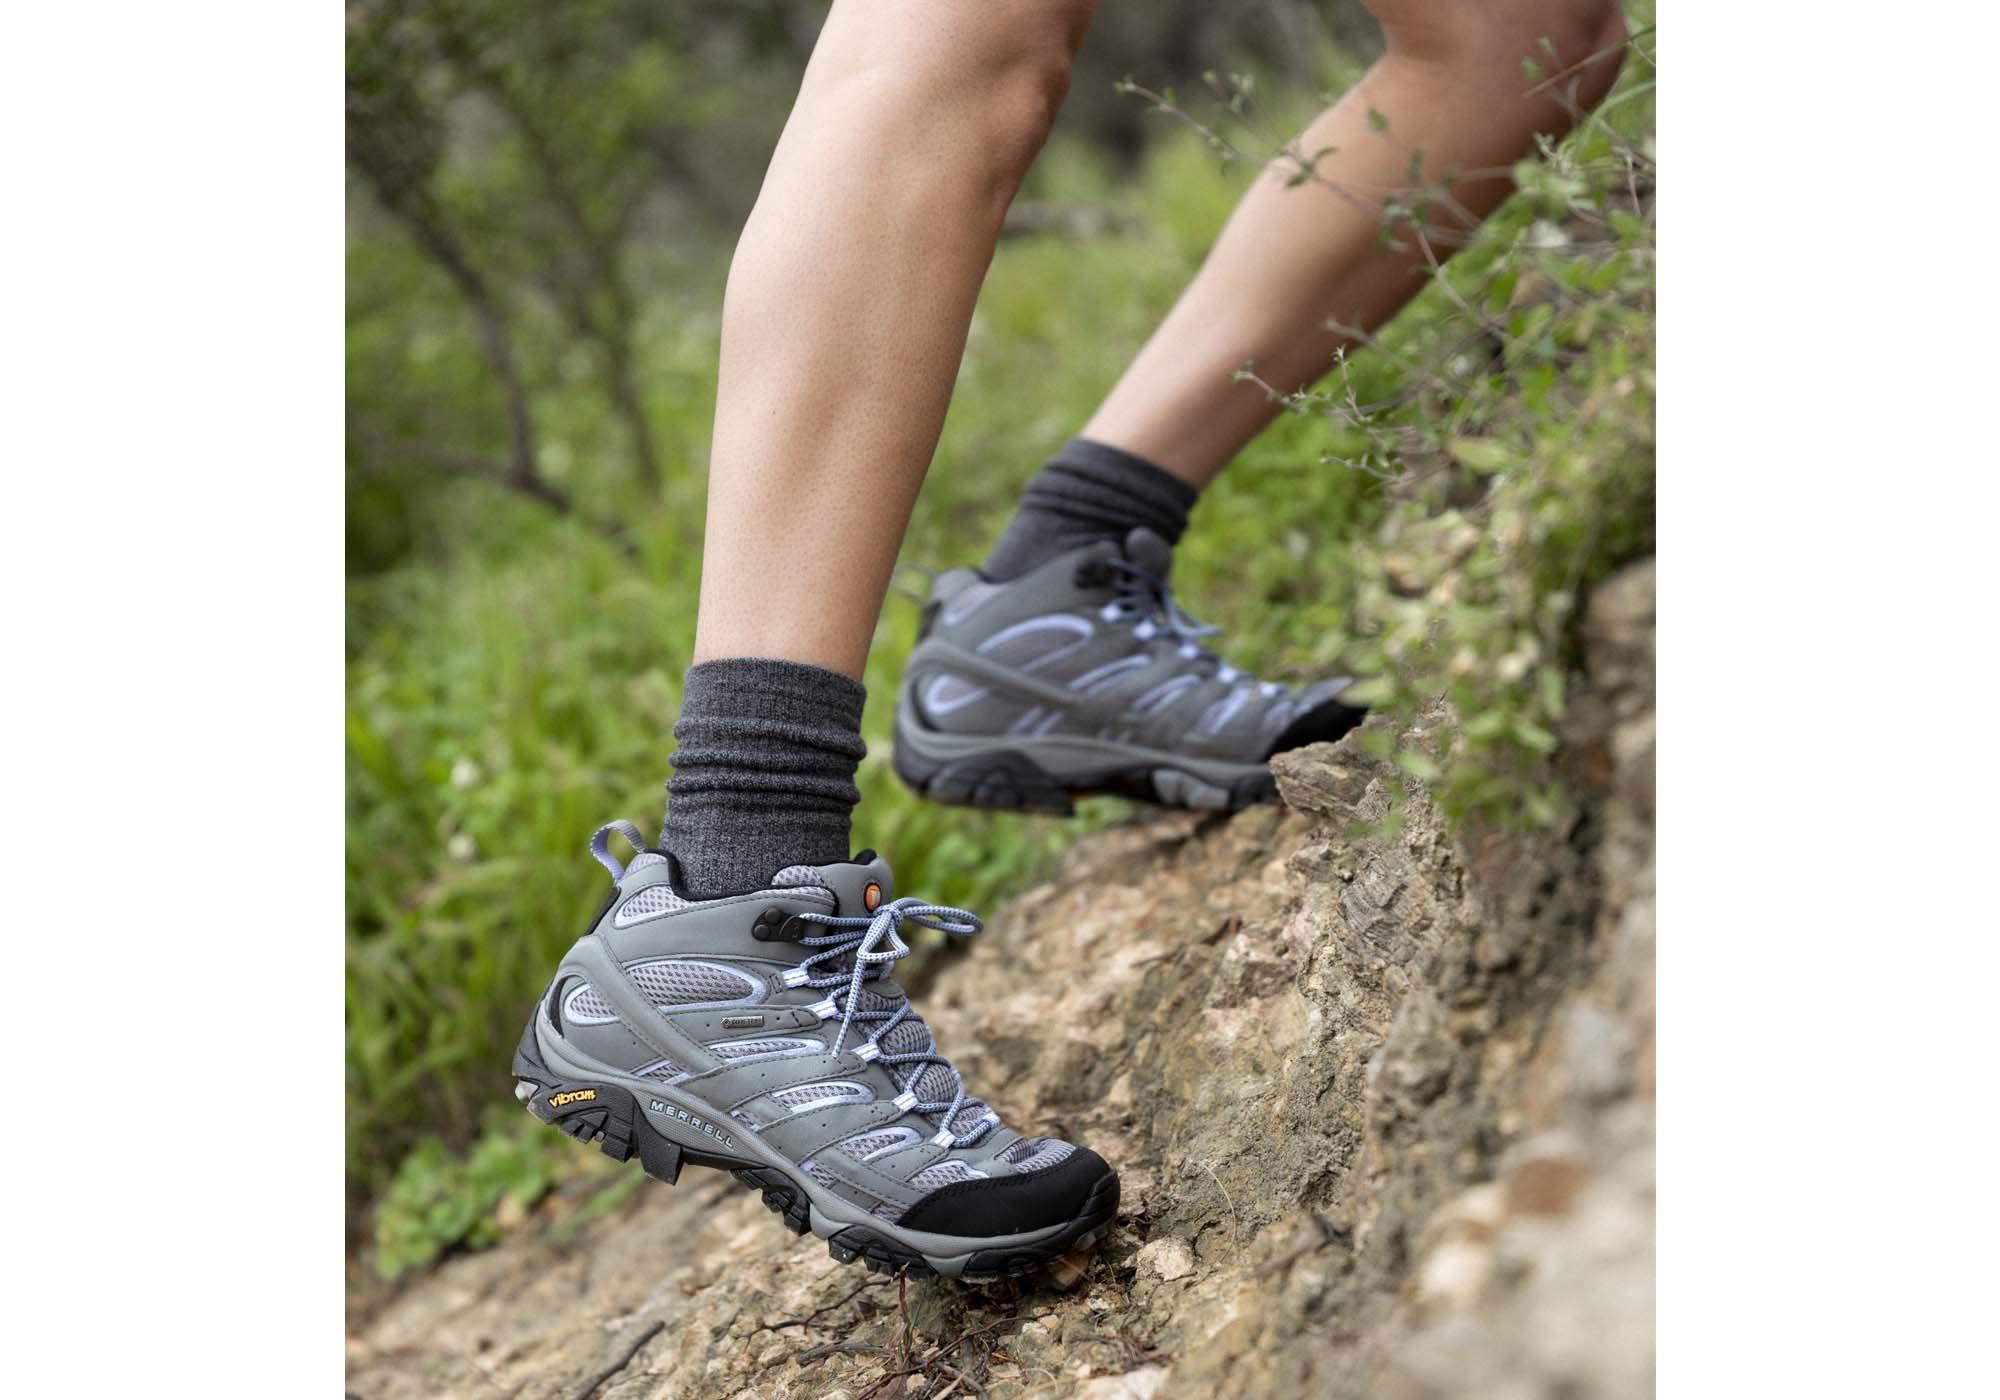 scarponcini da trekking economici